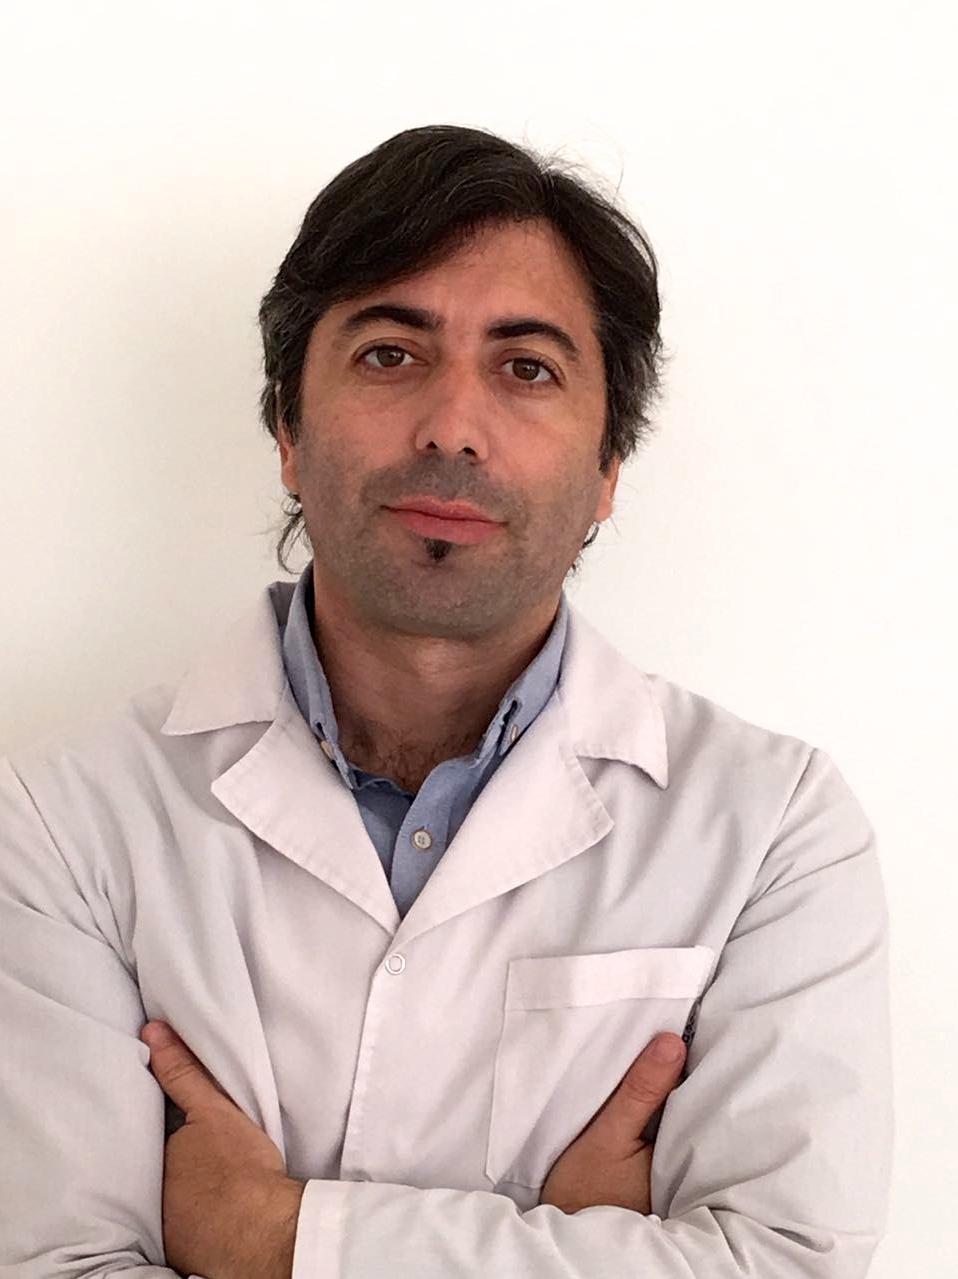 Dr. Poisson Martín